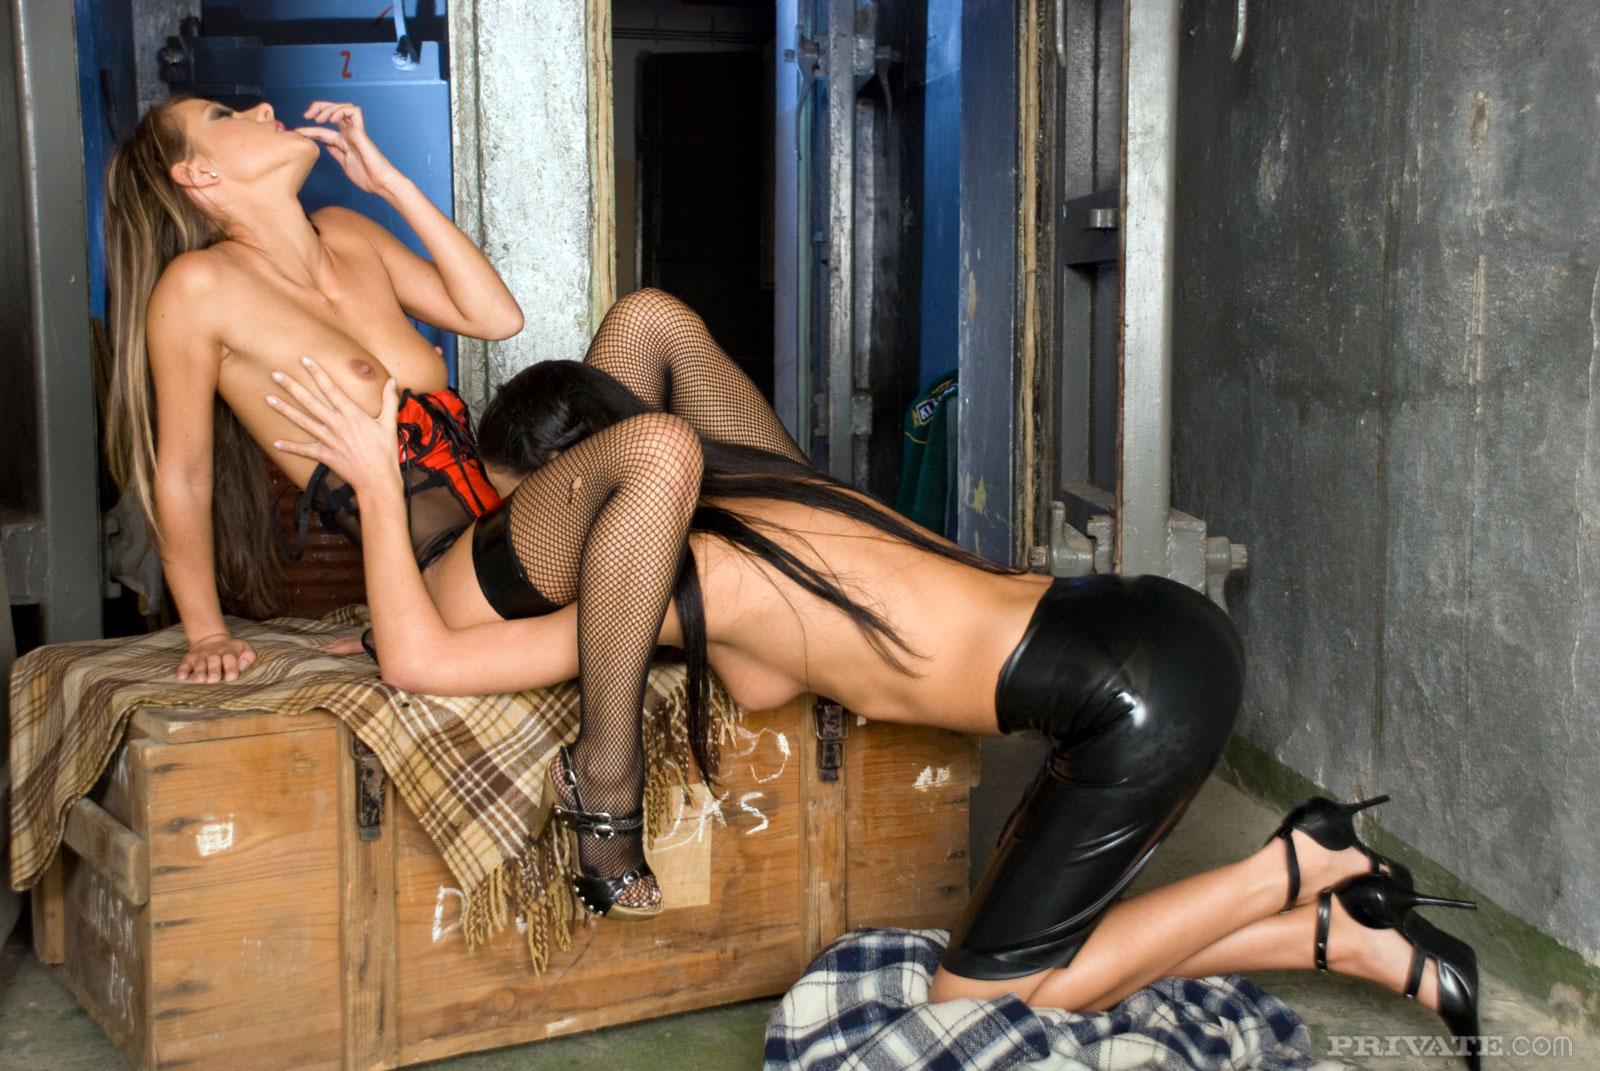 2е малышки Hana Black и Melisa занимаются лесби сексом